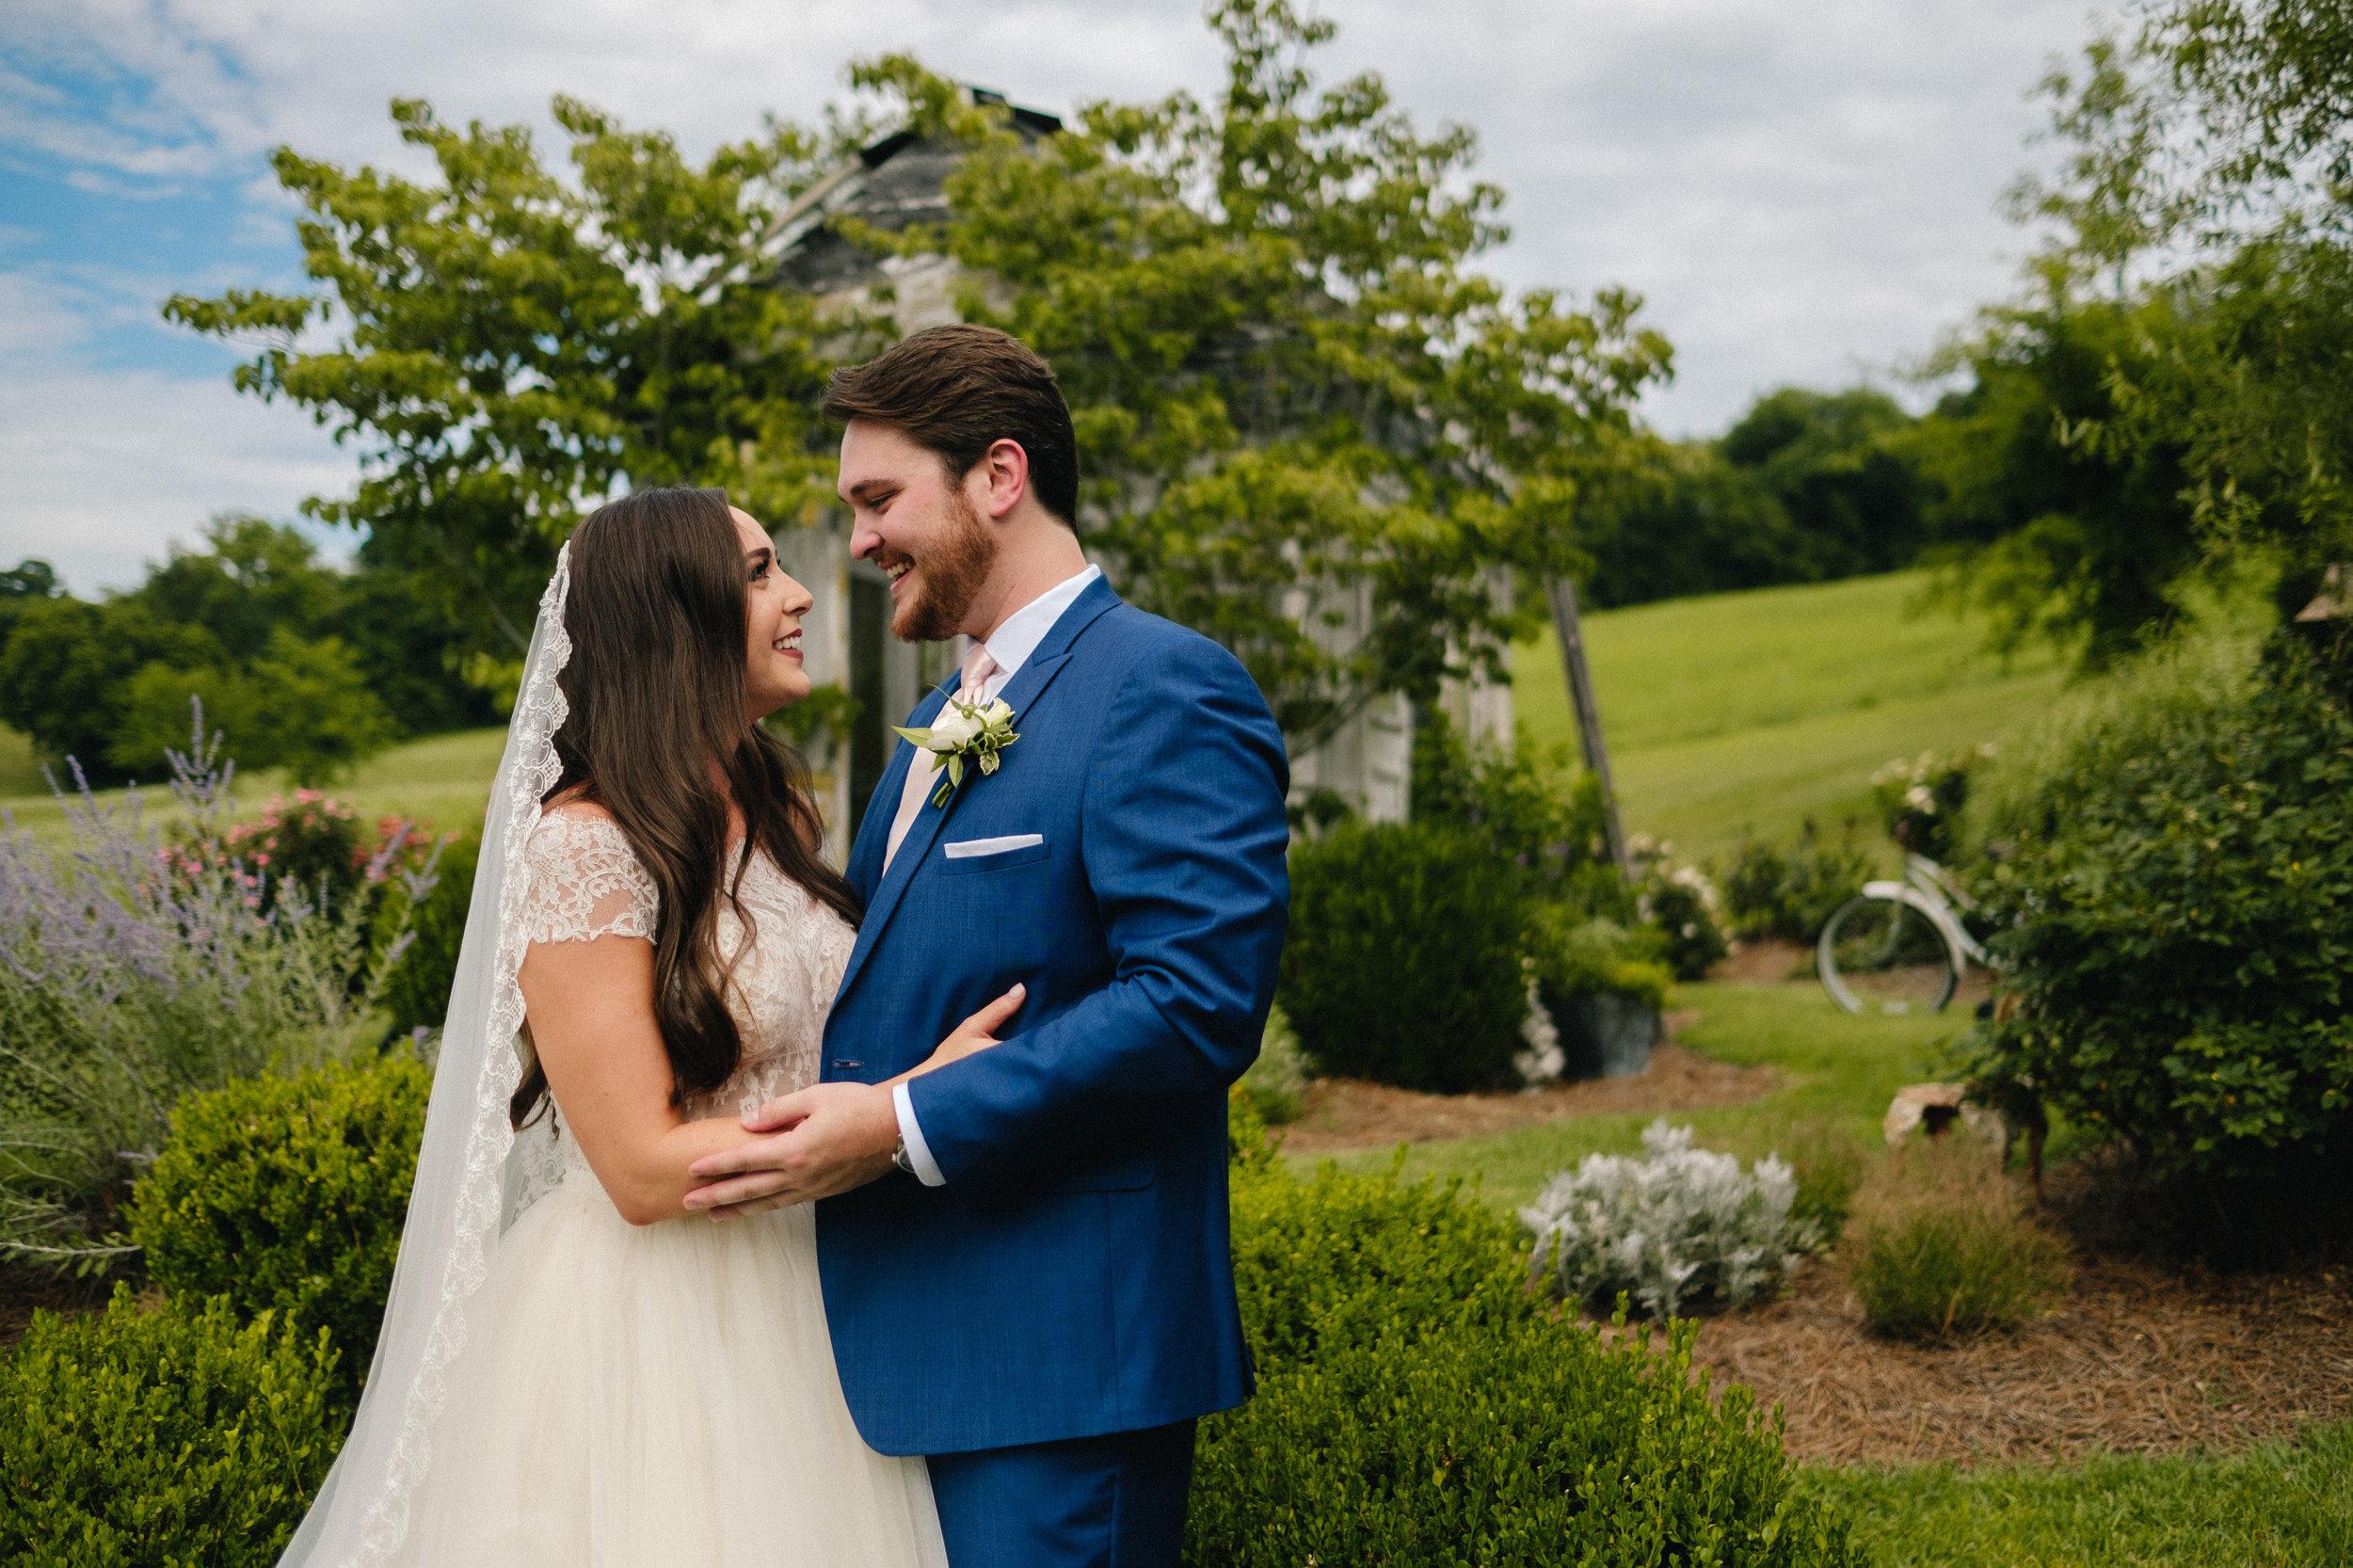 Nashville_Wedding_Photography_Mint_Springs_33.jpg